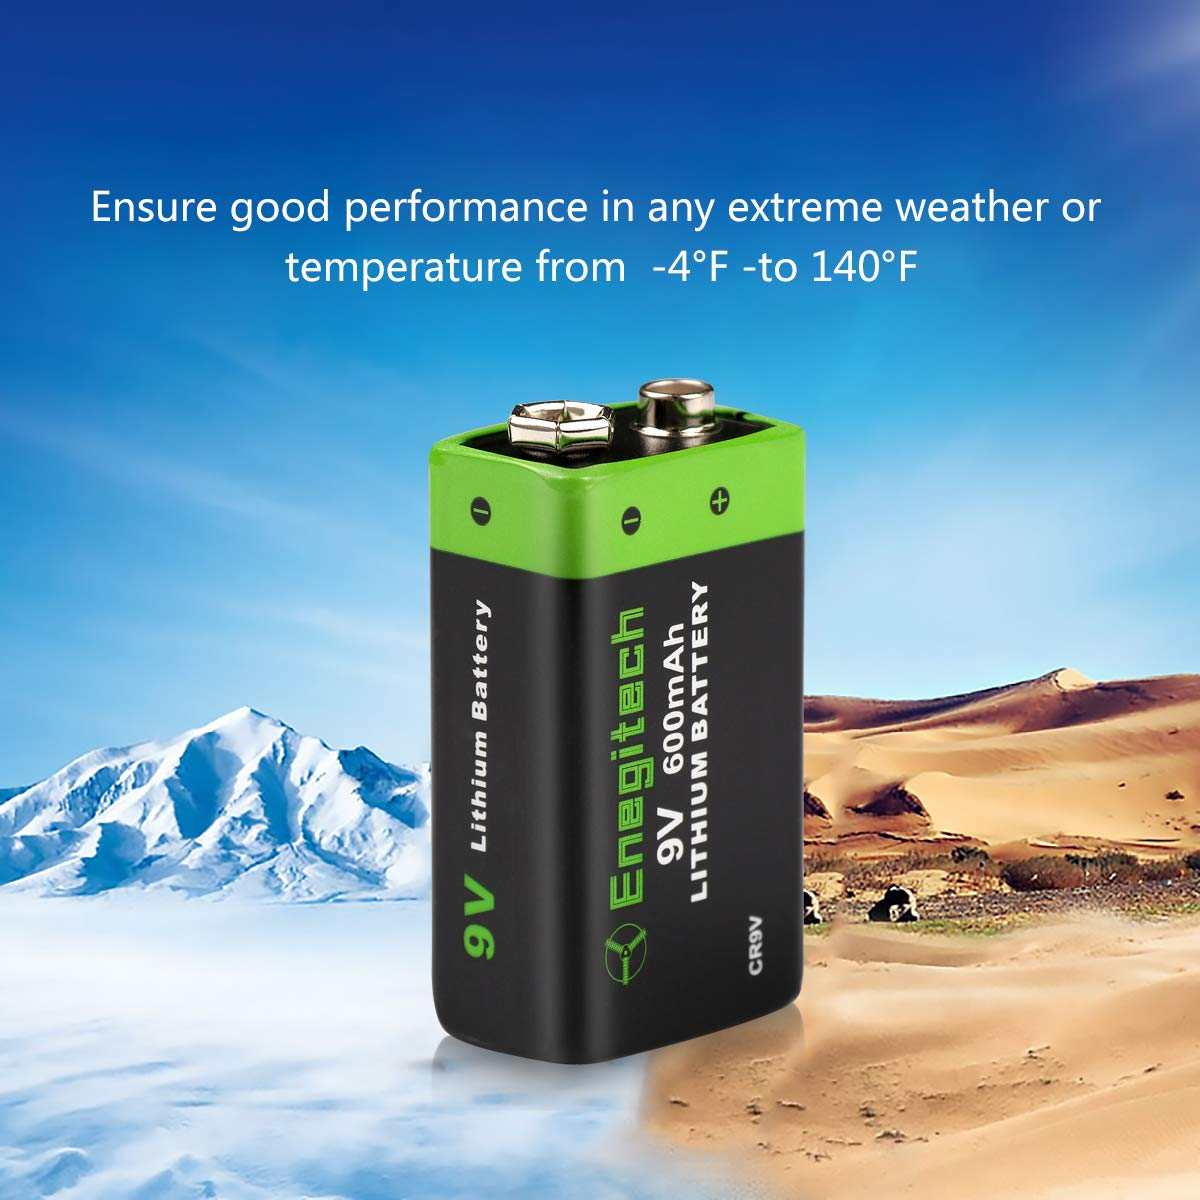 Enegitech 9V Lithium Battery 600mAh Non-Rechargeable Li-ion Battery for Smoke Detector Fire Alarm Multimeter, 8-Pack by Enegitech